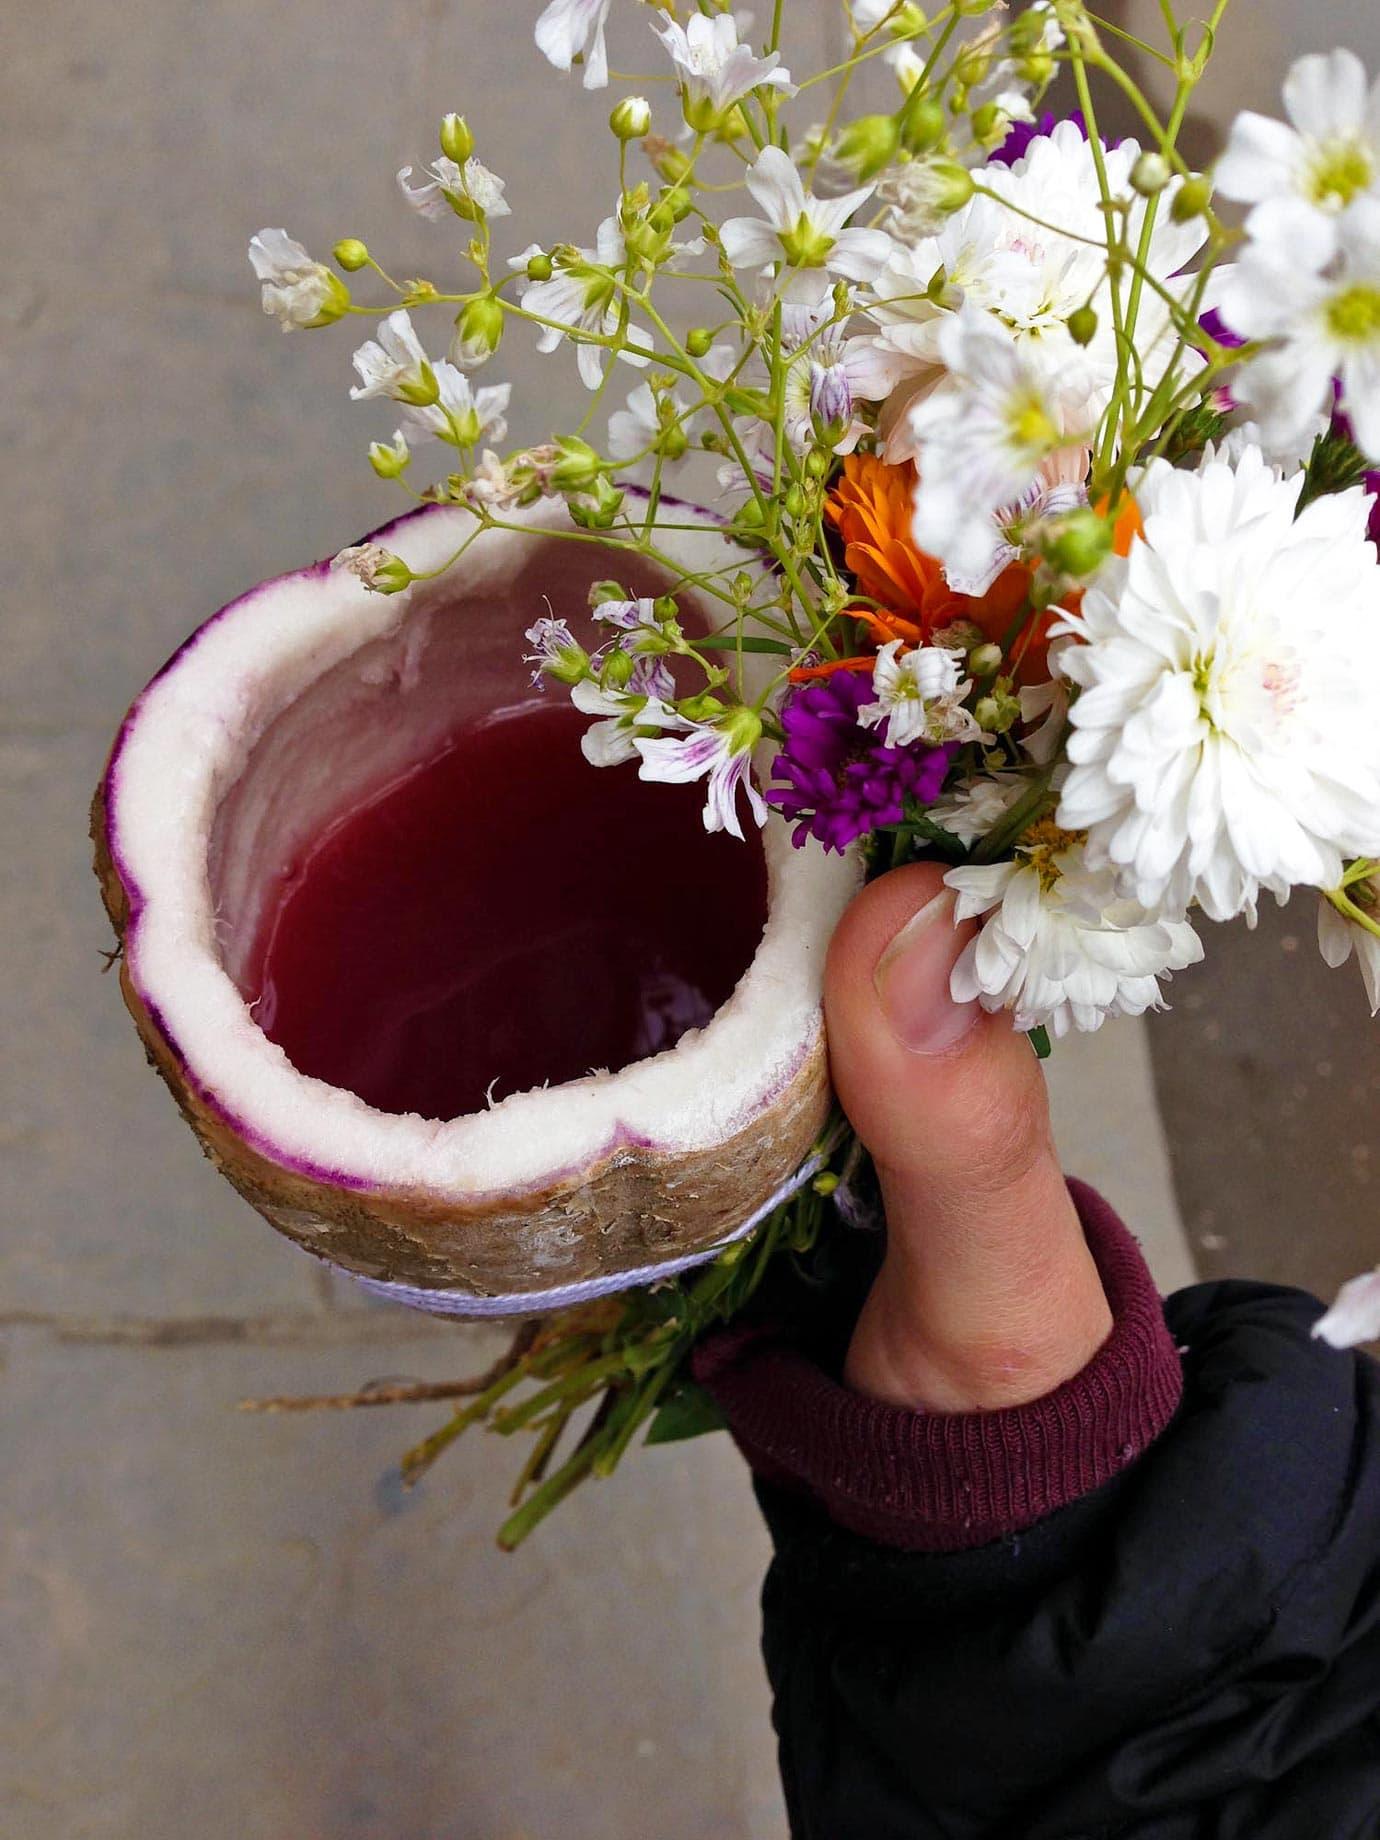 Fermented Grape Juice for Corpus Christi